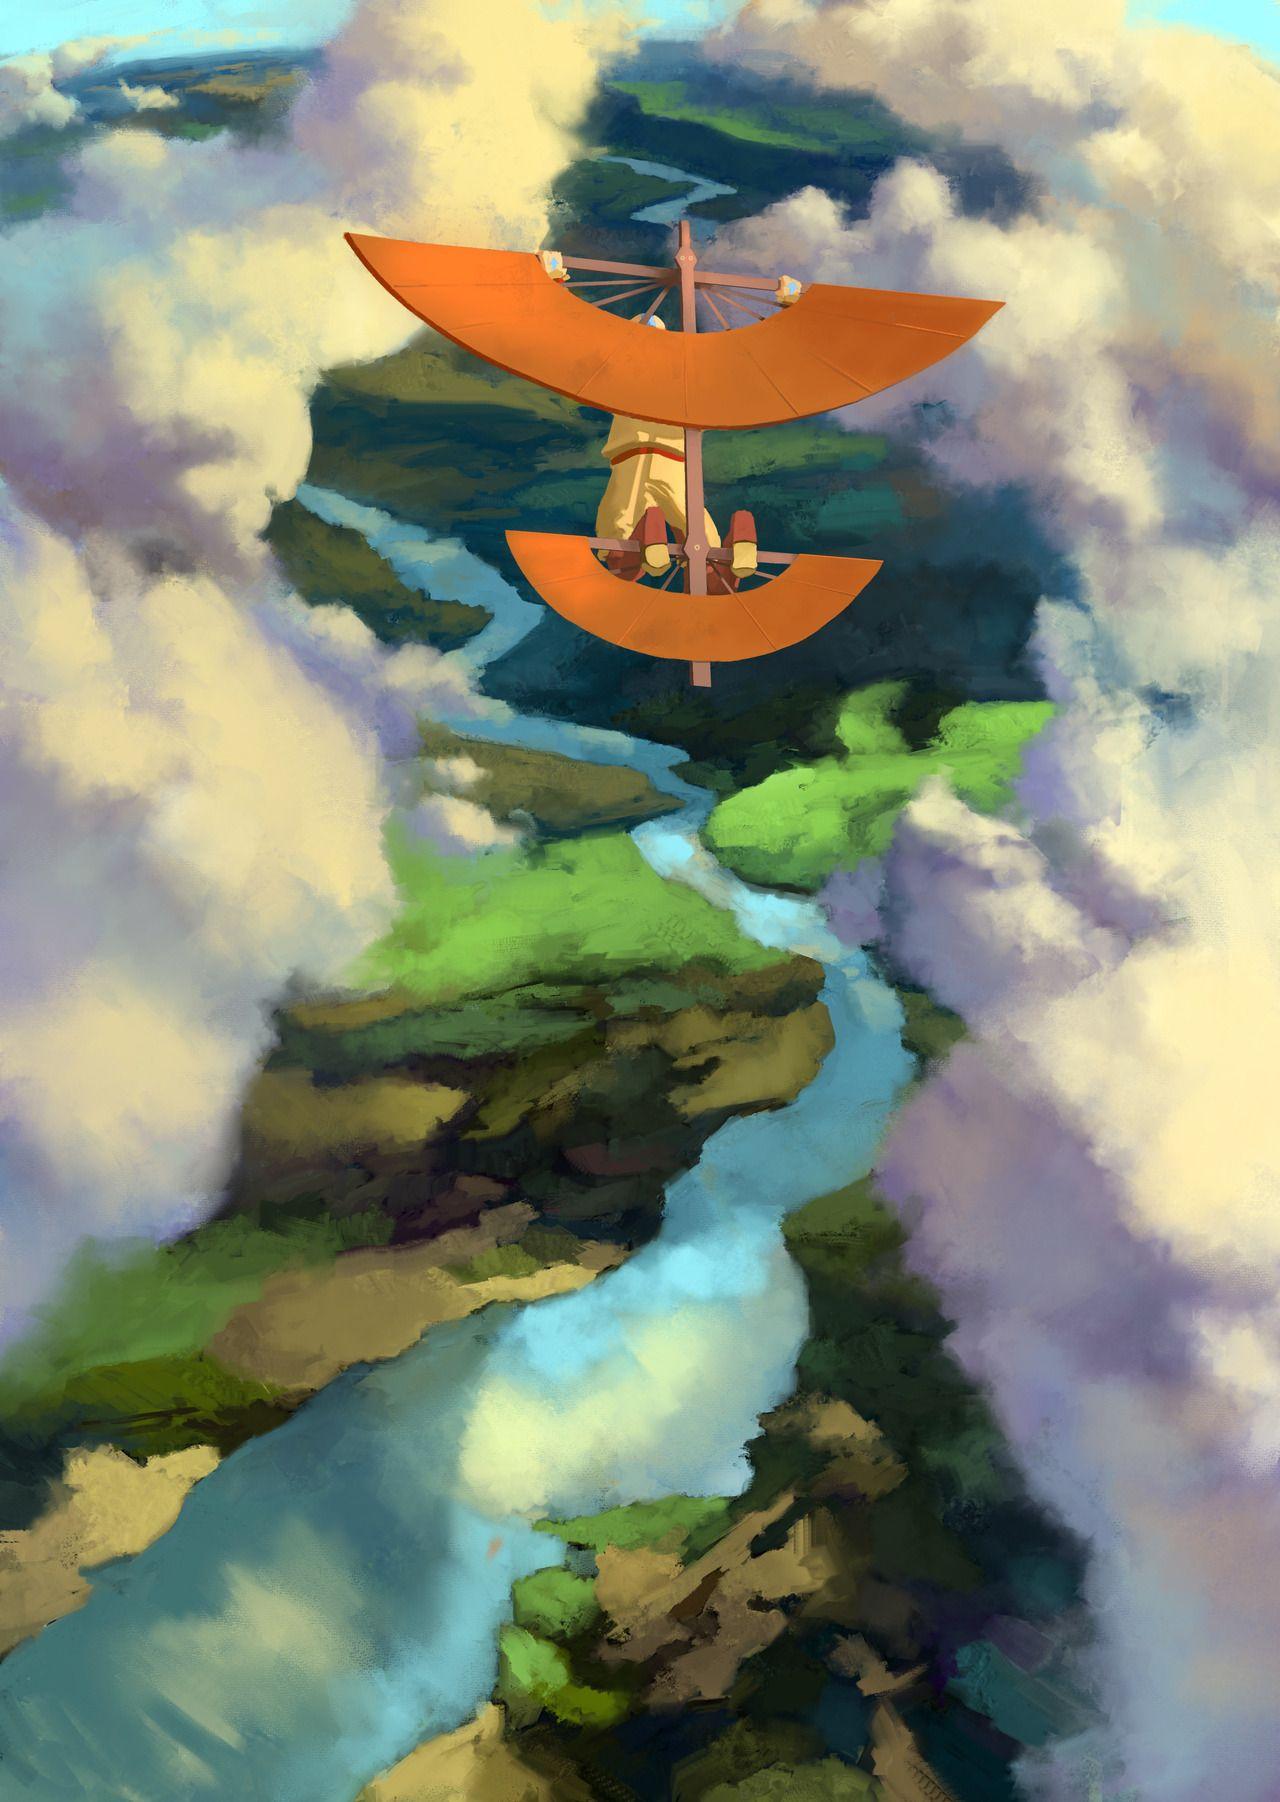 The Last Airbender Avatar Korra Dessin Anime